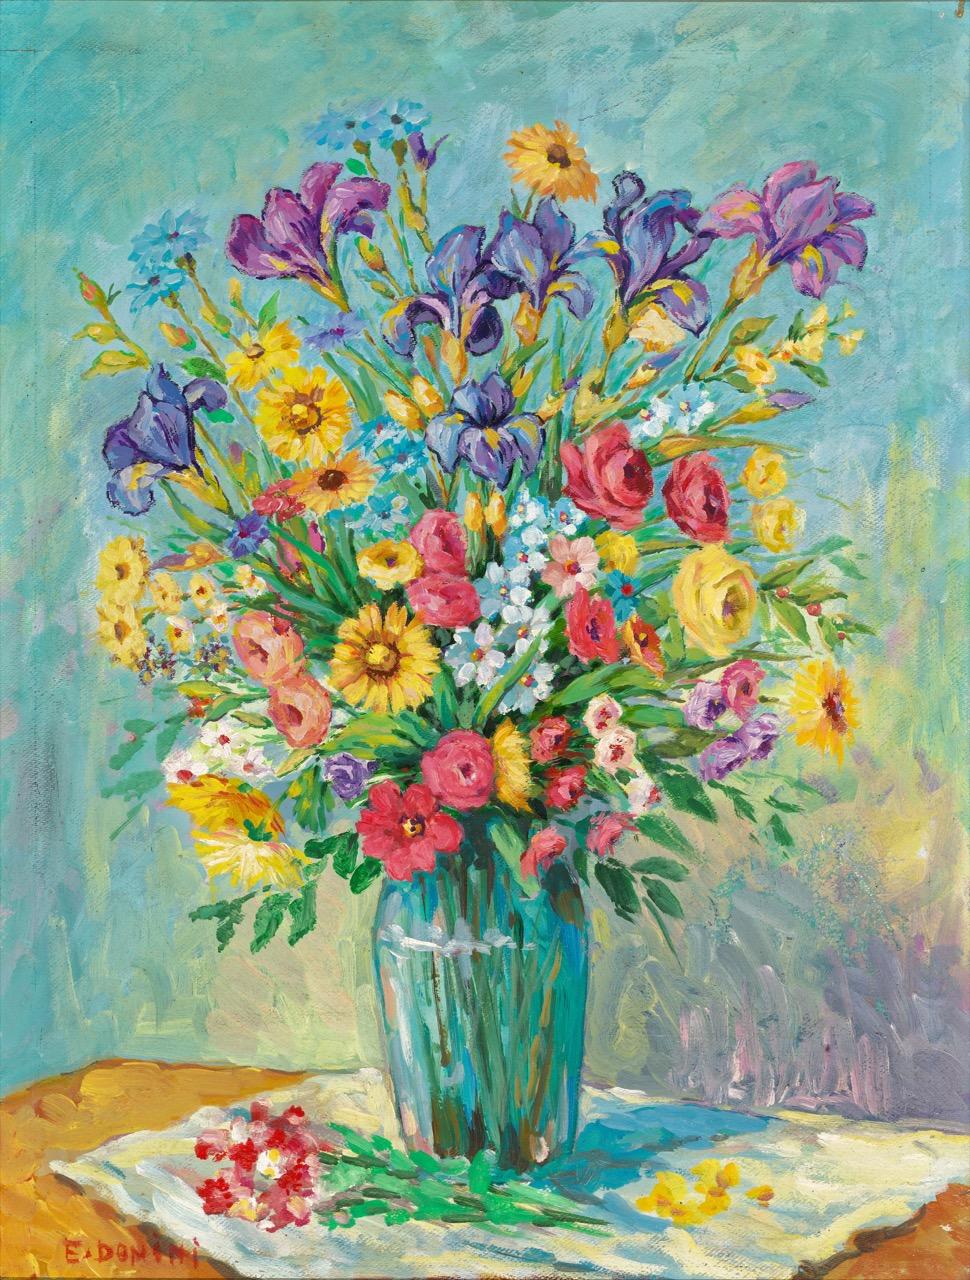 Vaso di fiori, anni '80, olio su faesite, 80x60 cm